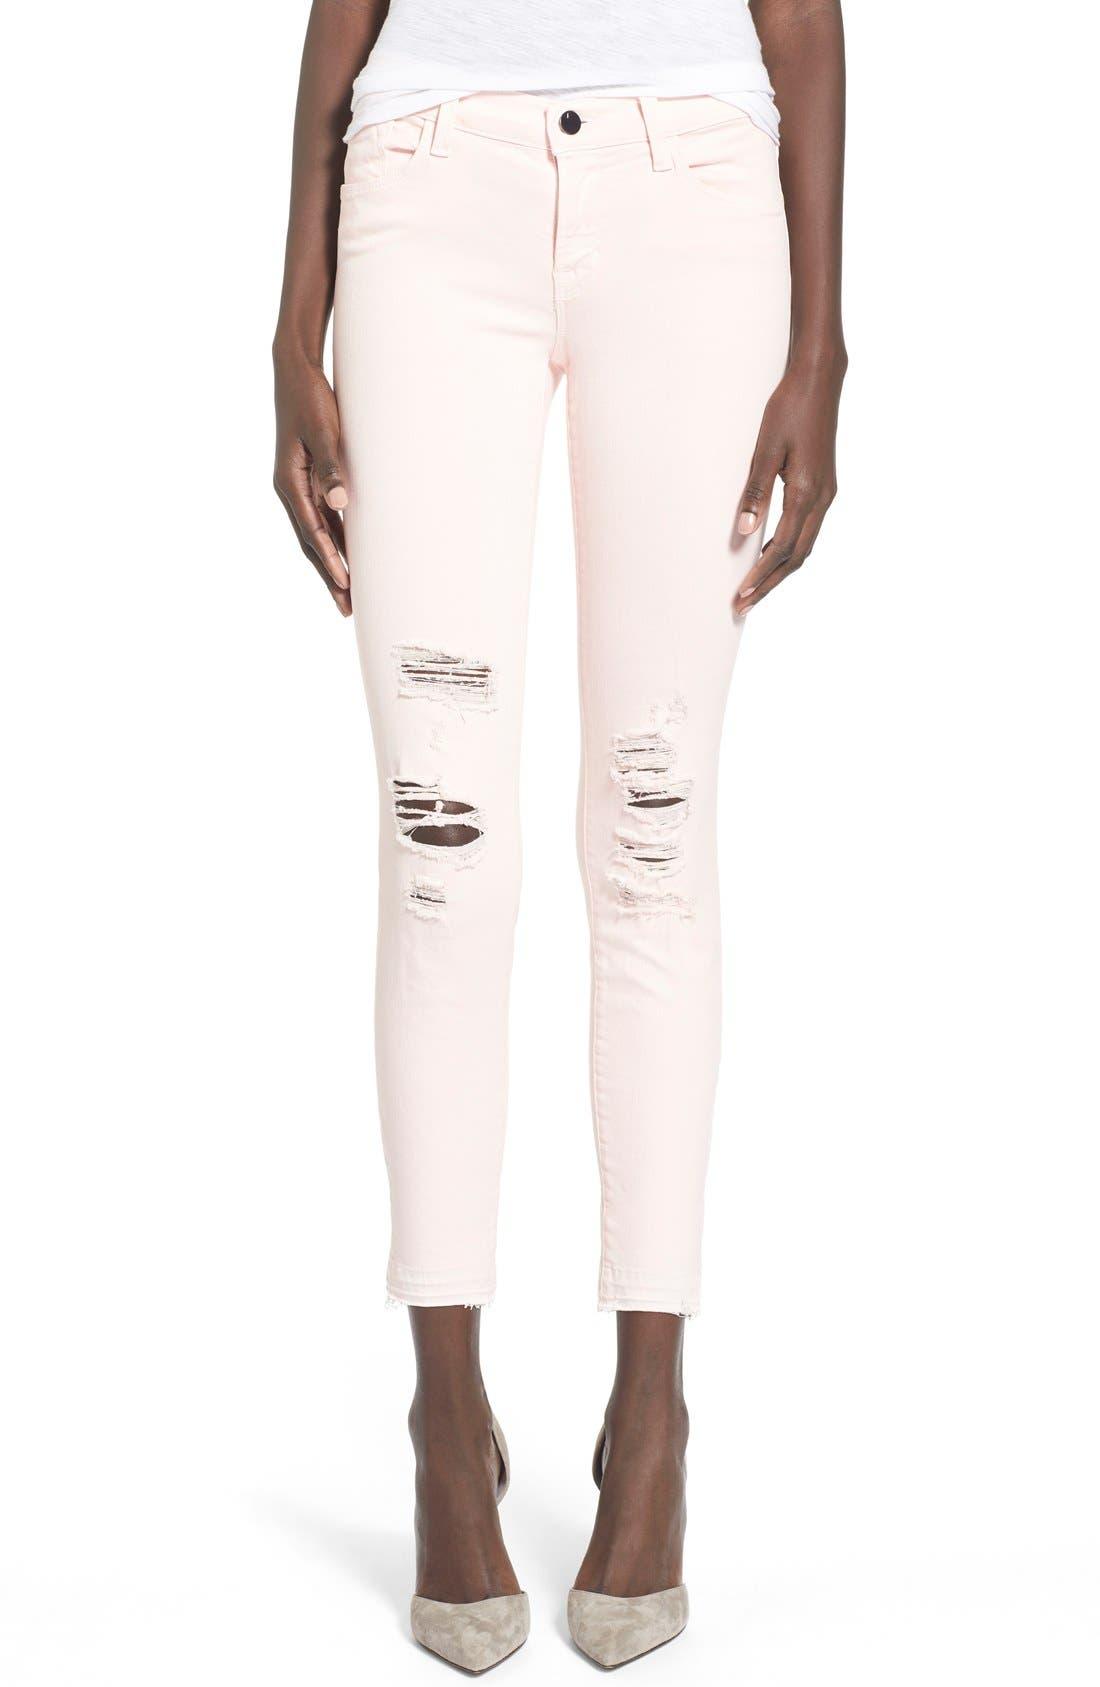 J BRAND,                             'Little Pink Jean' Low RiseCropSkinny Jeans,                             Main thumbnail 1, color,                             650